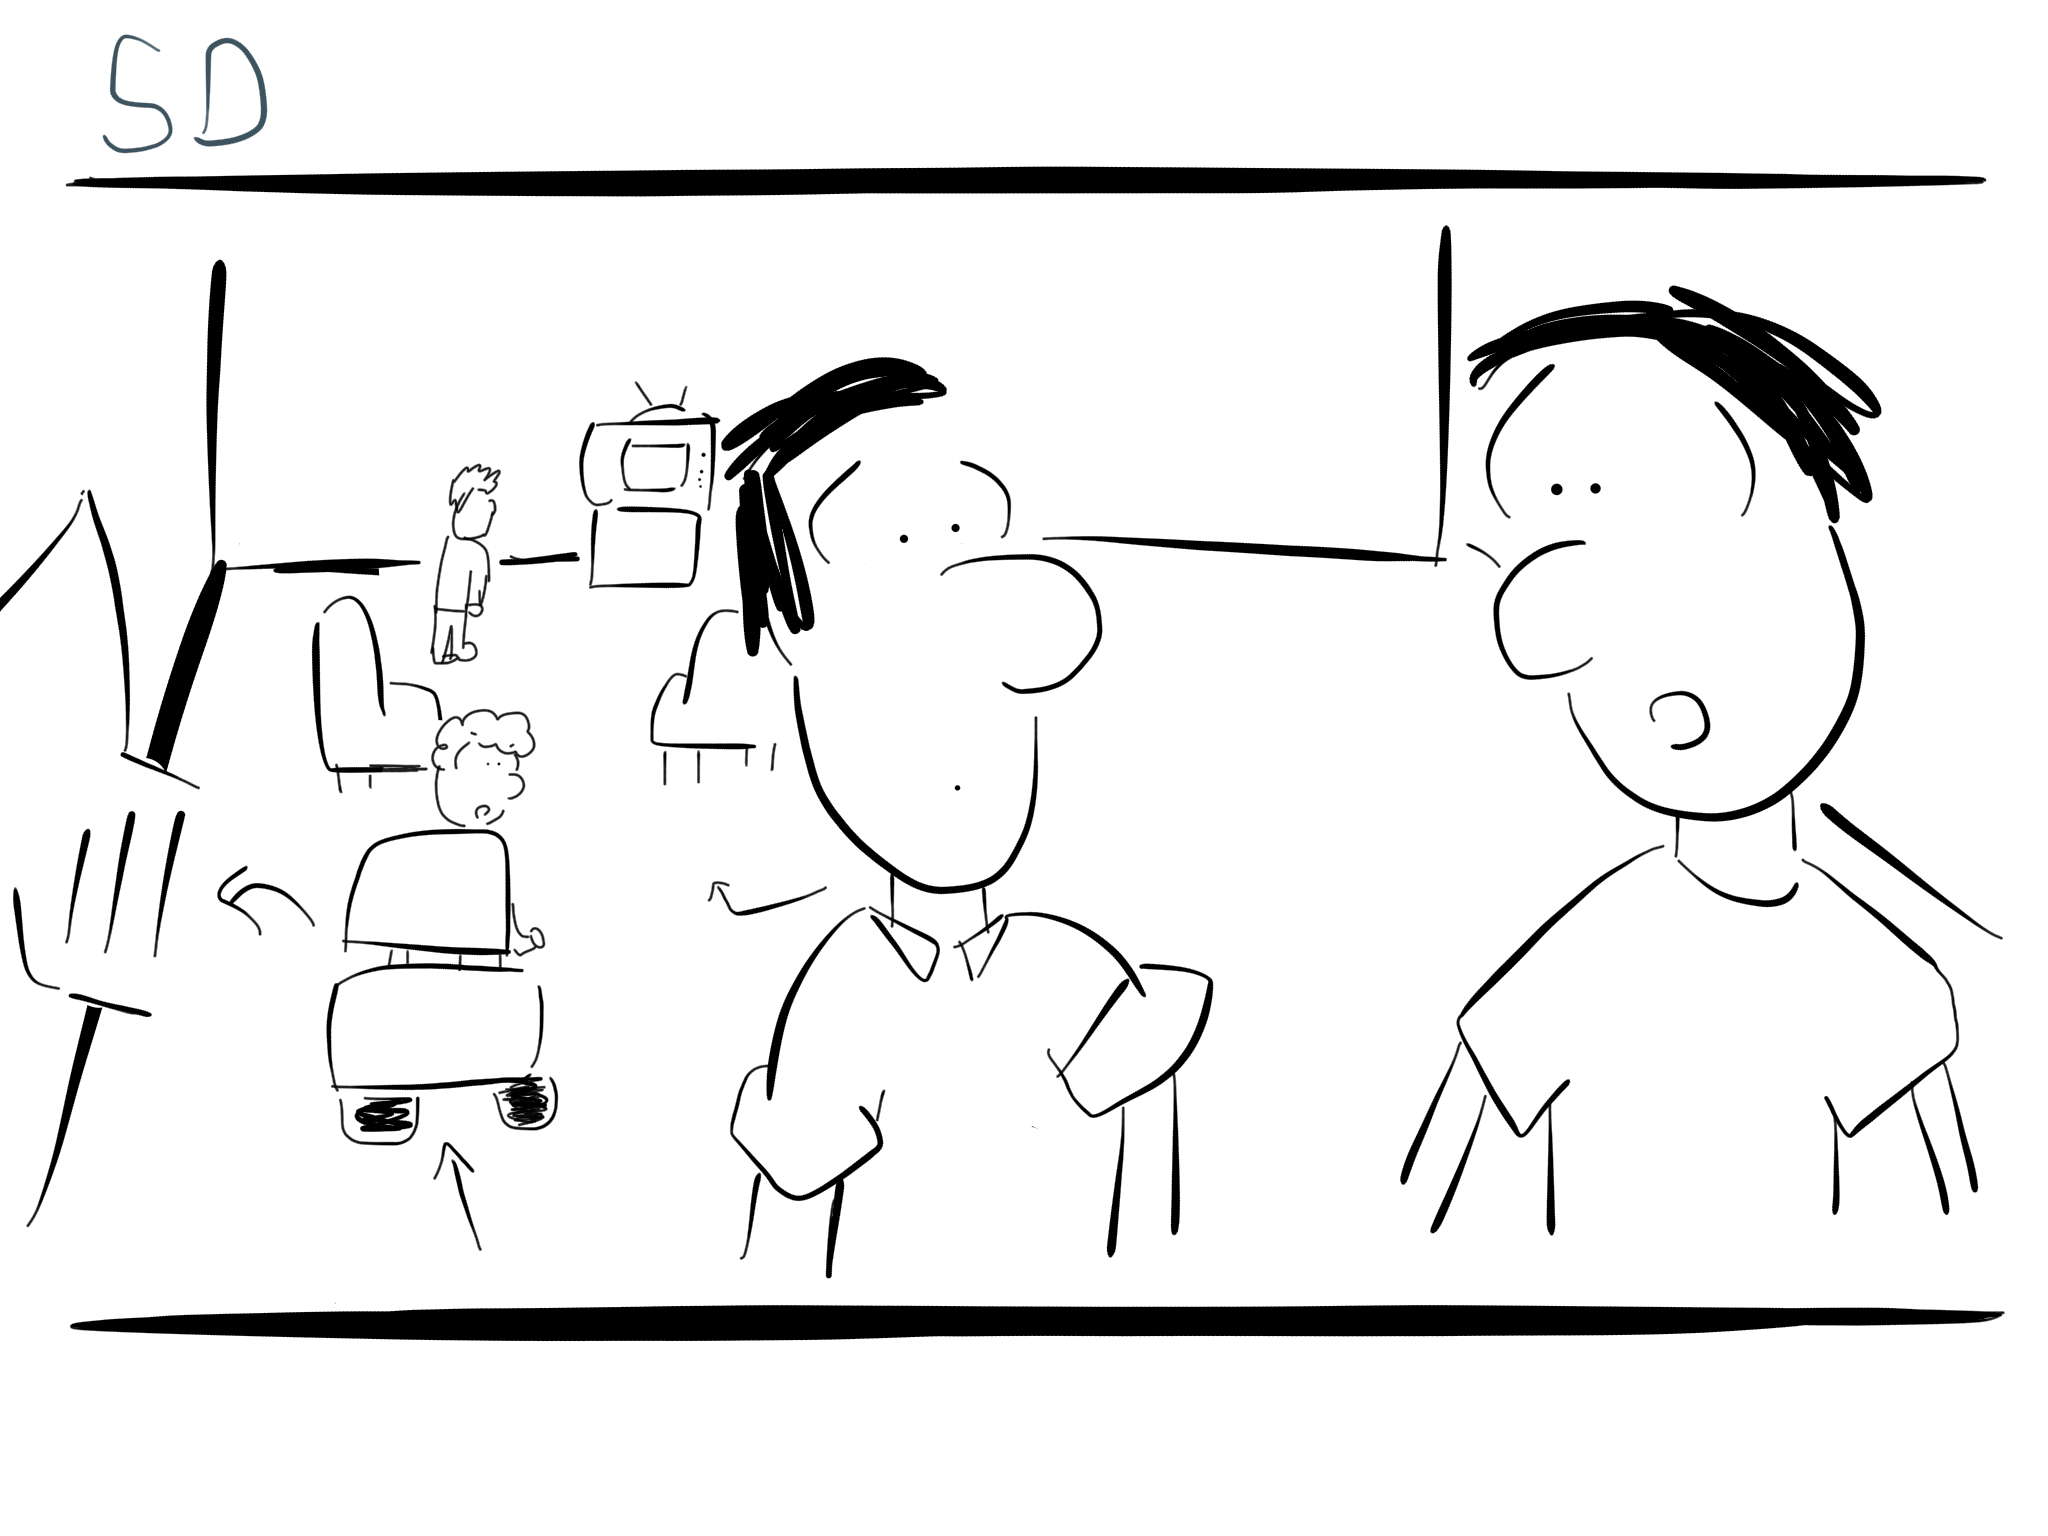 BDF_Storyboards_21.jpg